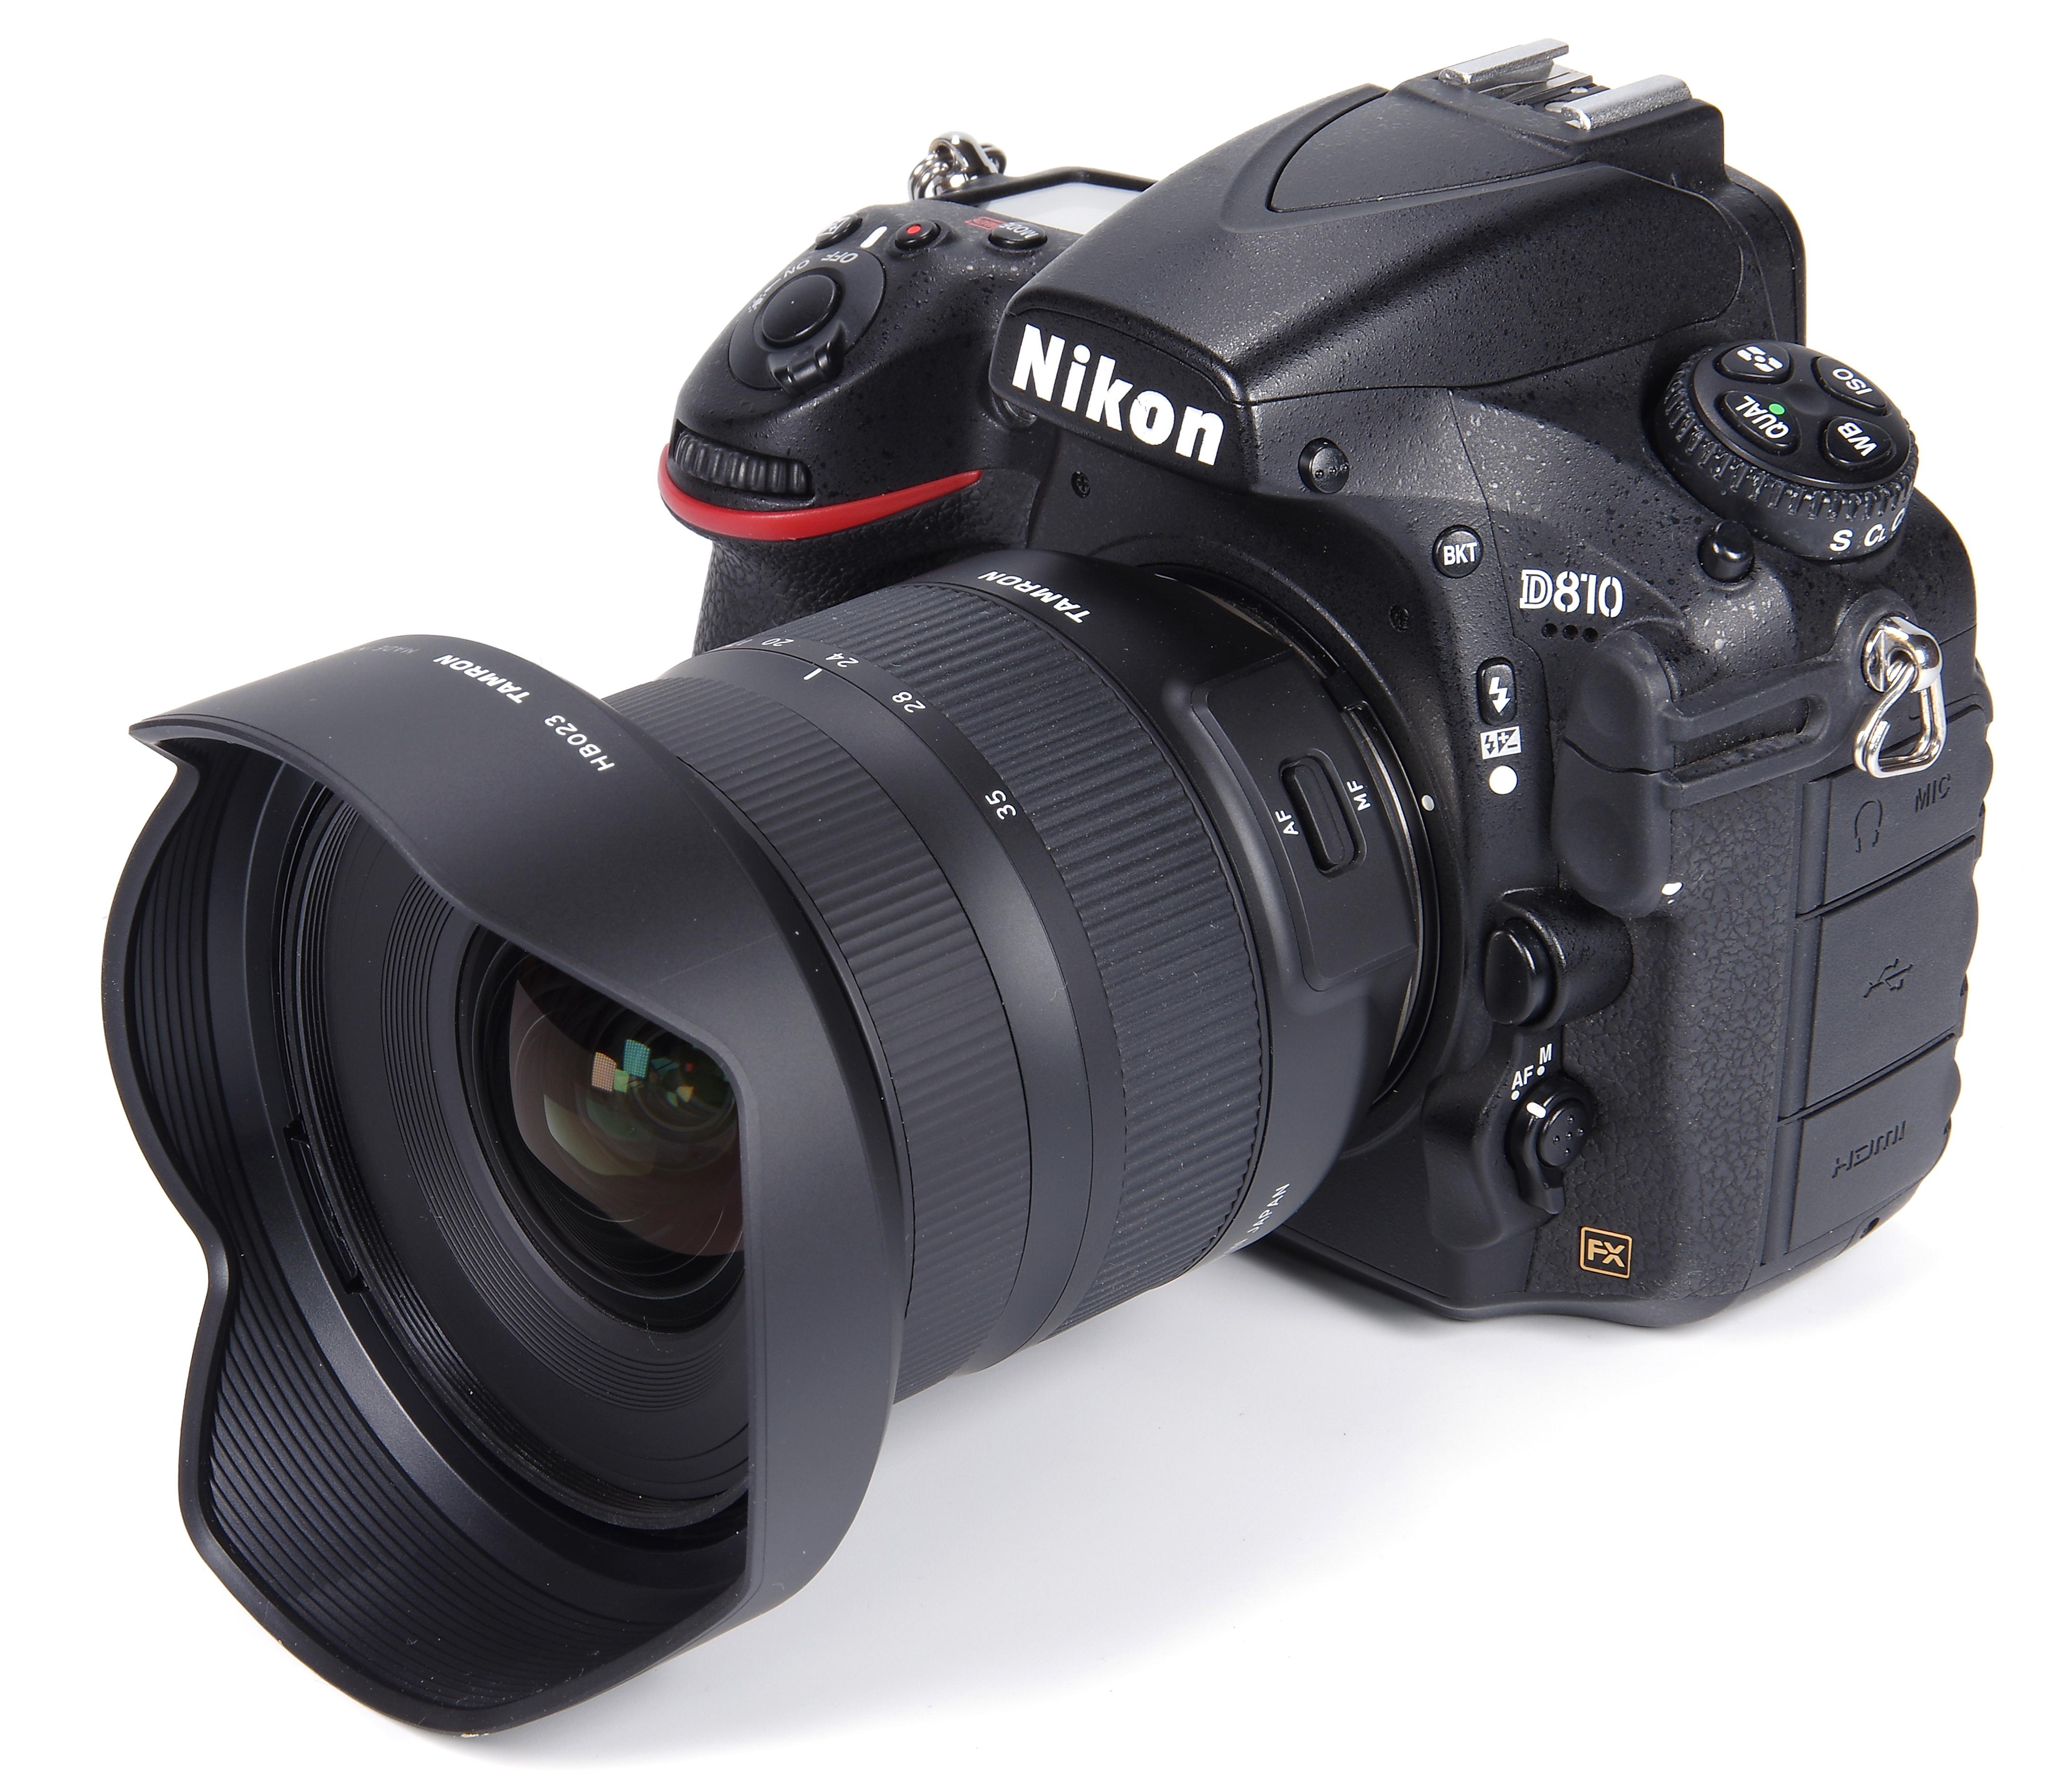 Tamron 17-35mm f/2 8-4 Di OSD Lens Review | ePHOTOzine